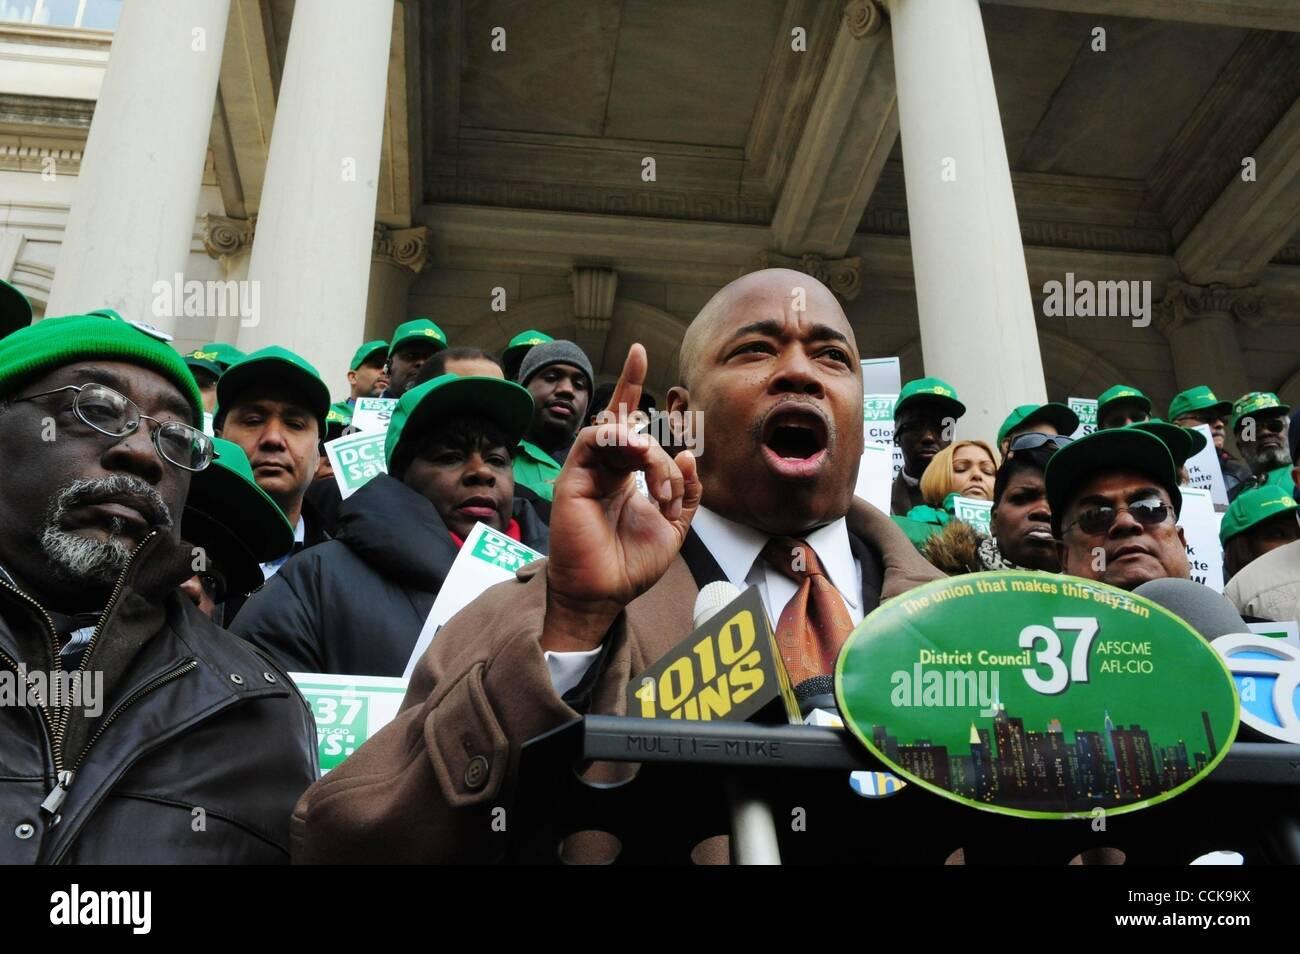 Dec. 3, 2010 - Manhattan, New York, U.S. - New York State Senate Racing & Wagering Chair ERIC ADAMS speaks as union Stock Photo